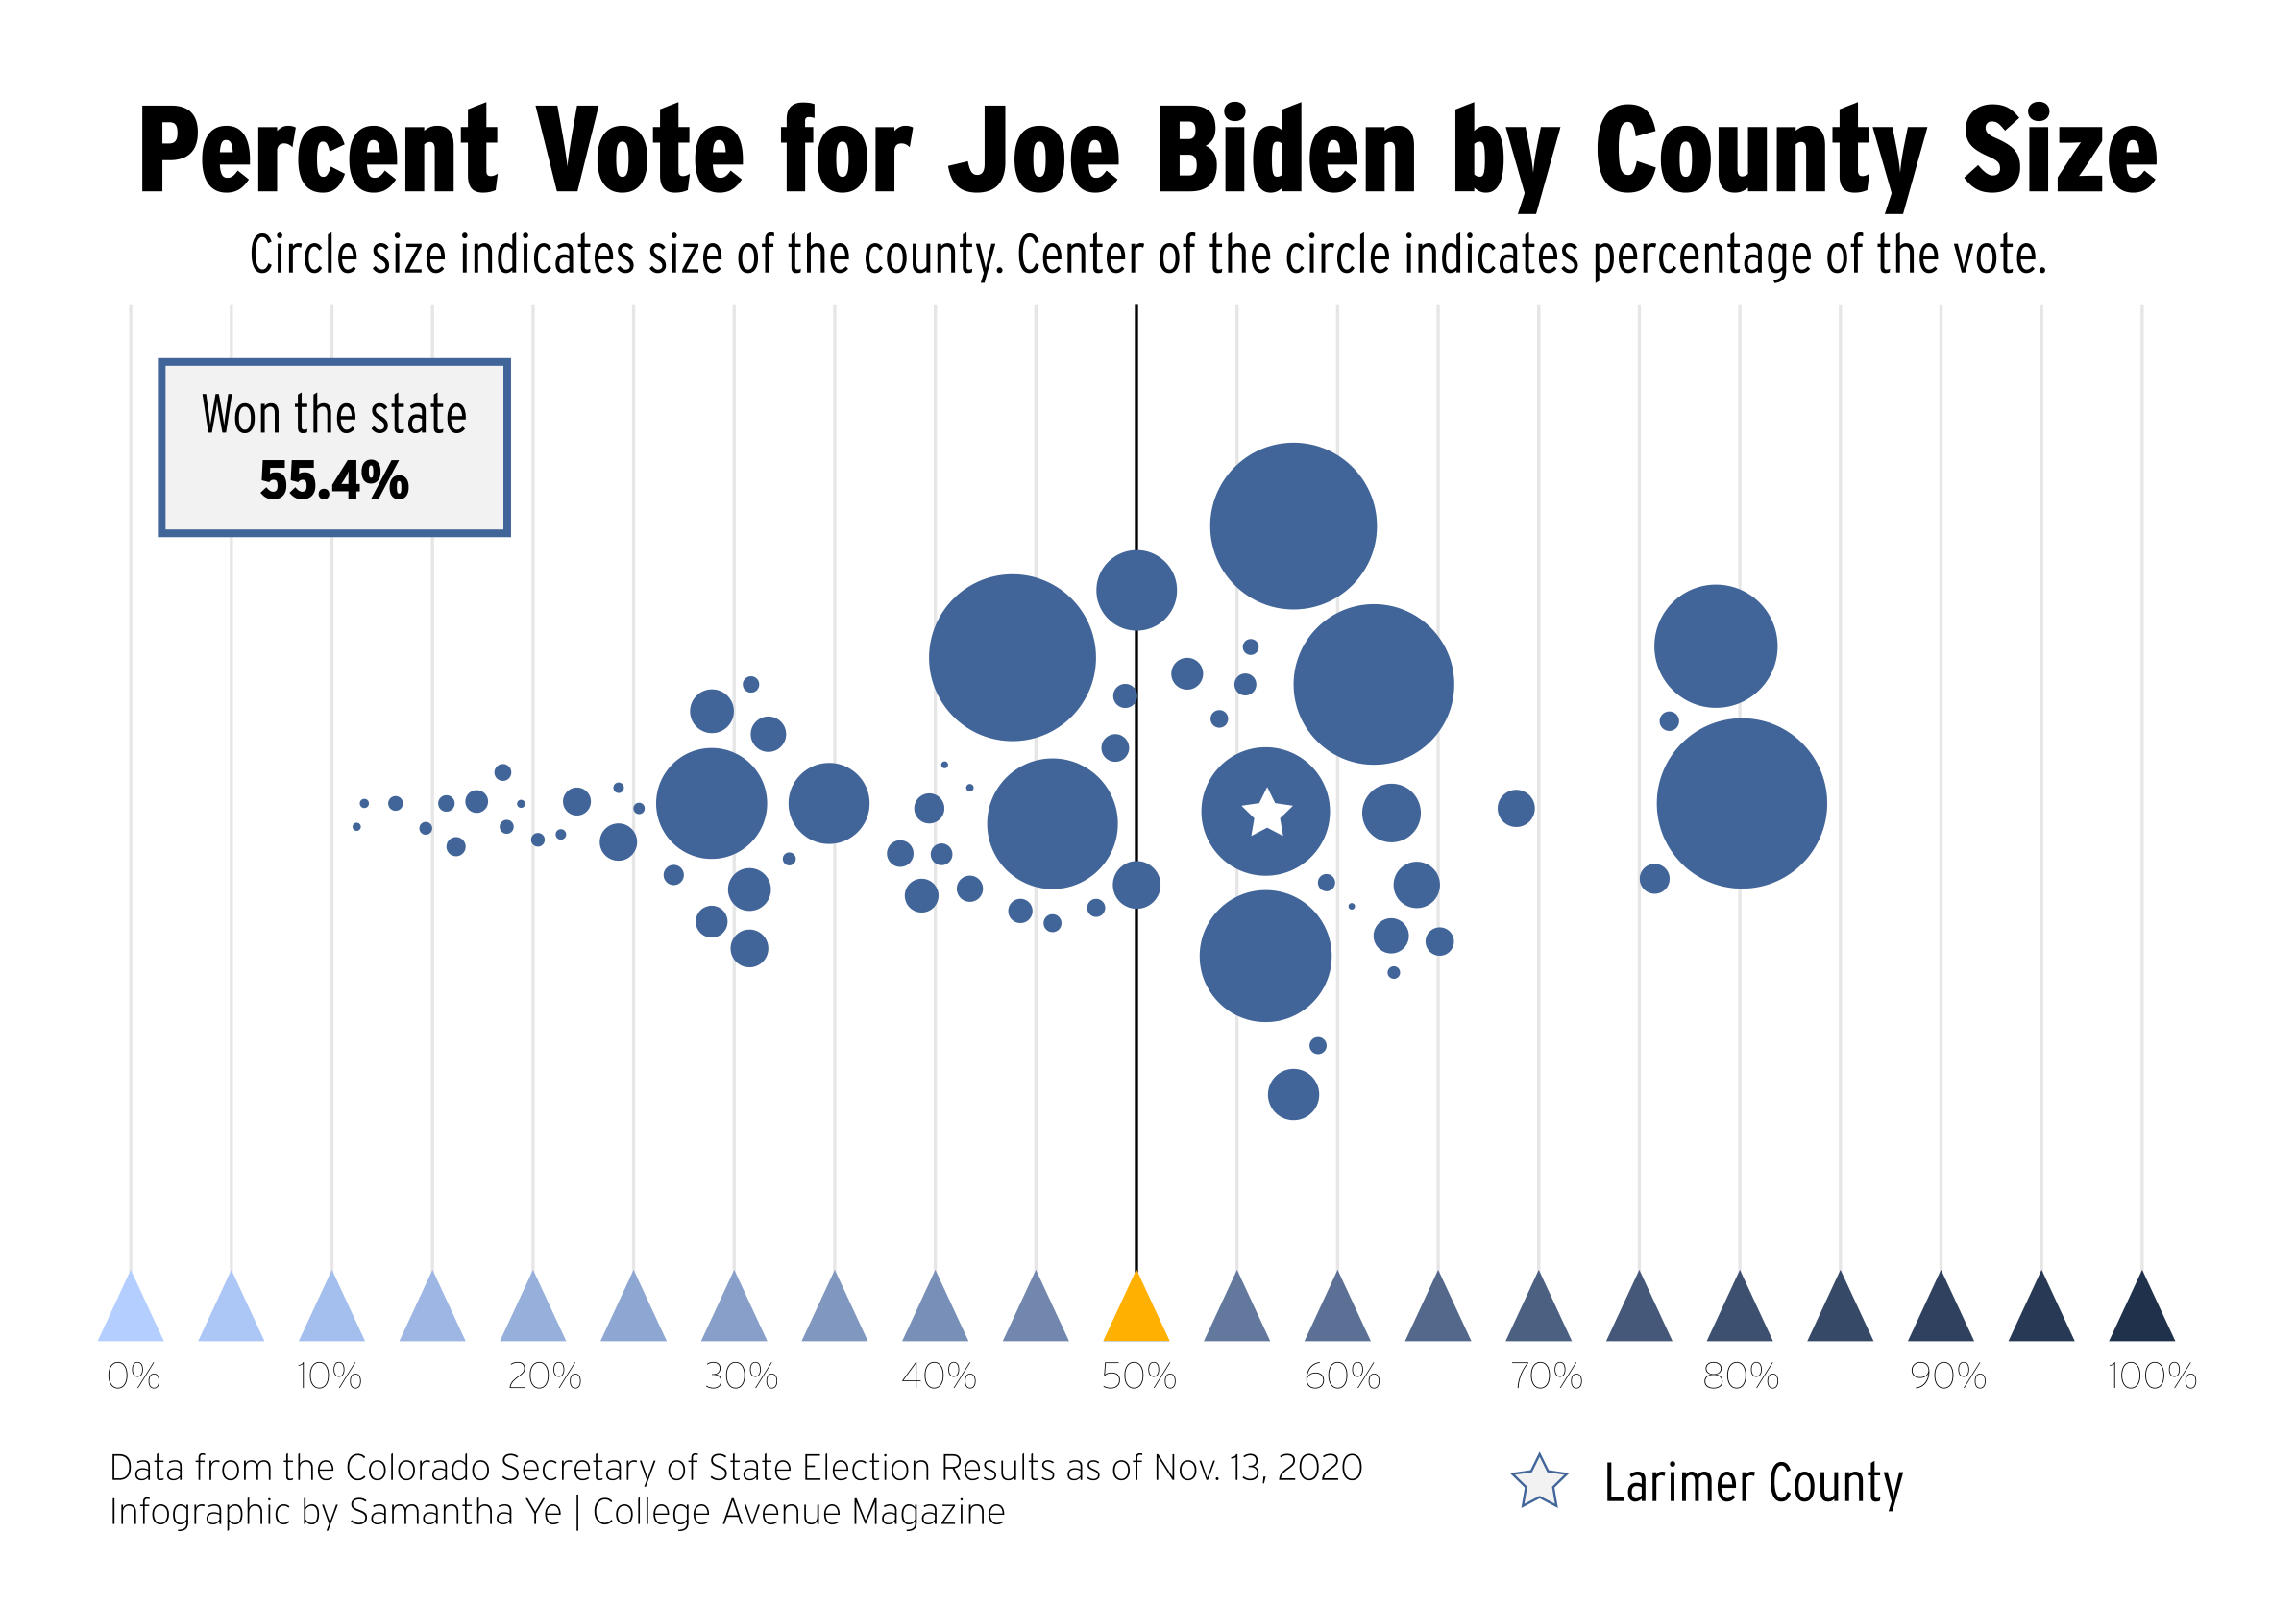 Percent Vote for Joe Biden by County Size